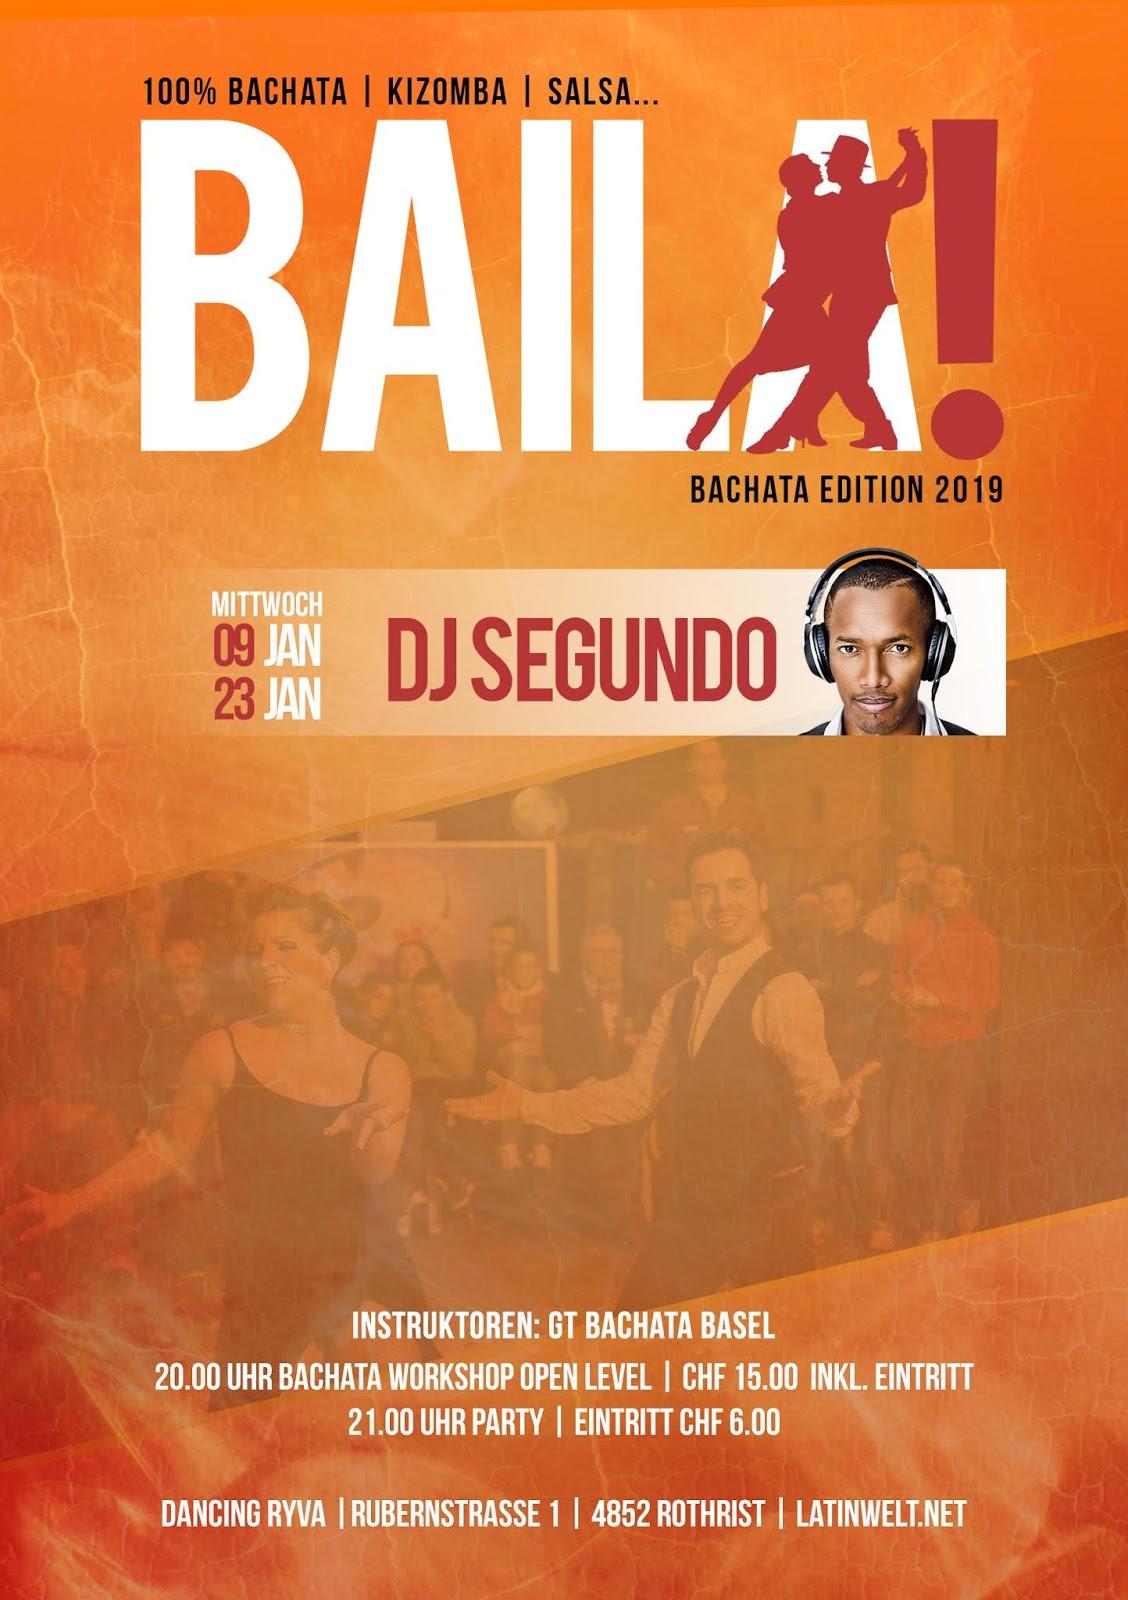 Baila, Bachata Edition!